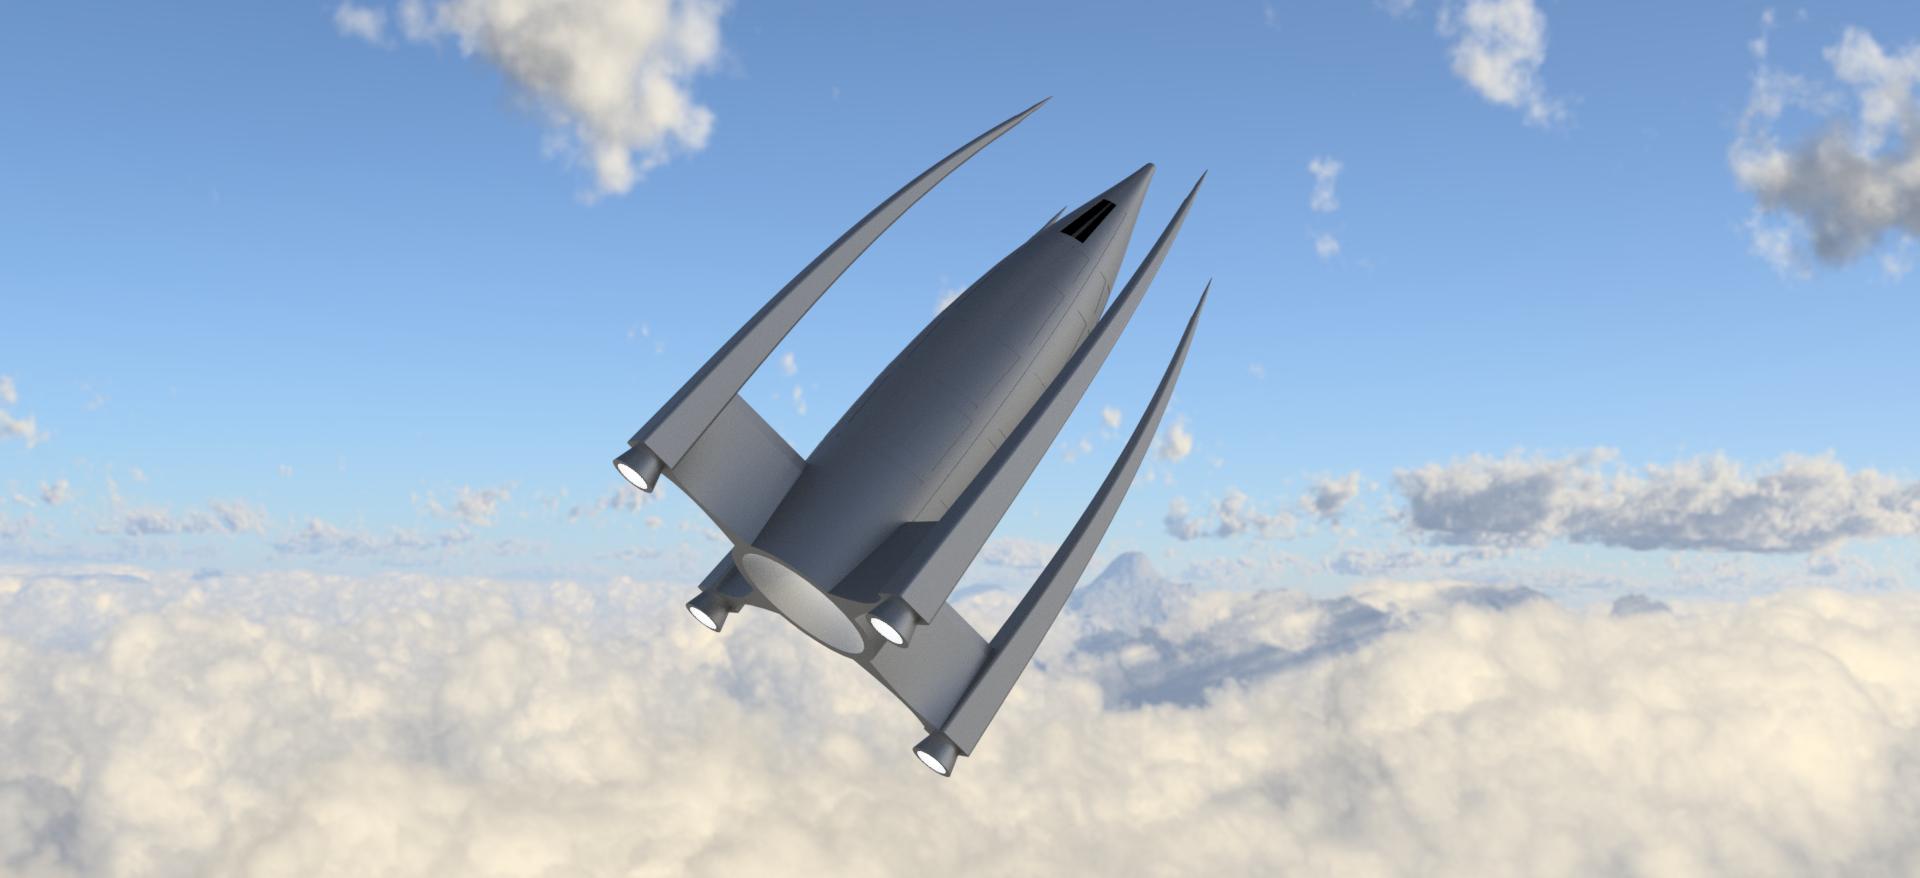 Práctica nave tema 8 Render Fusion 360